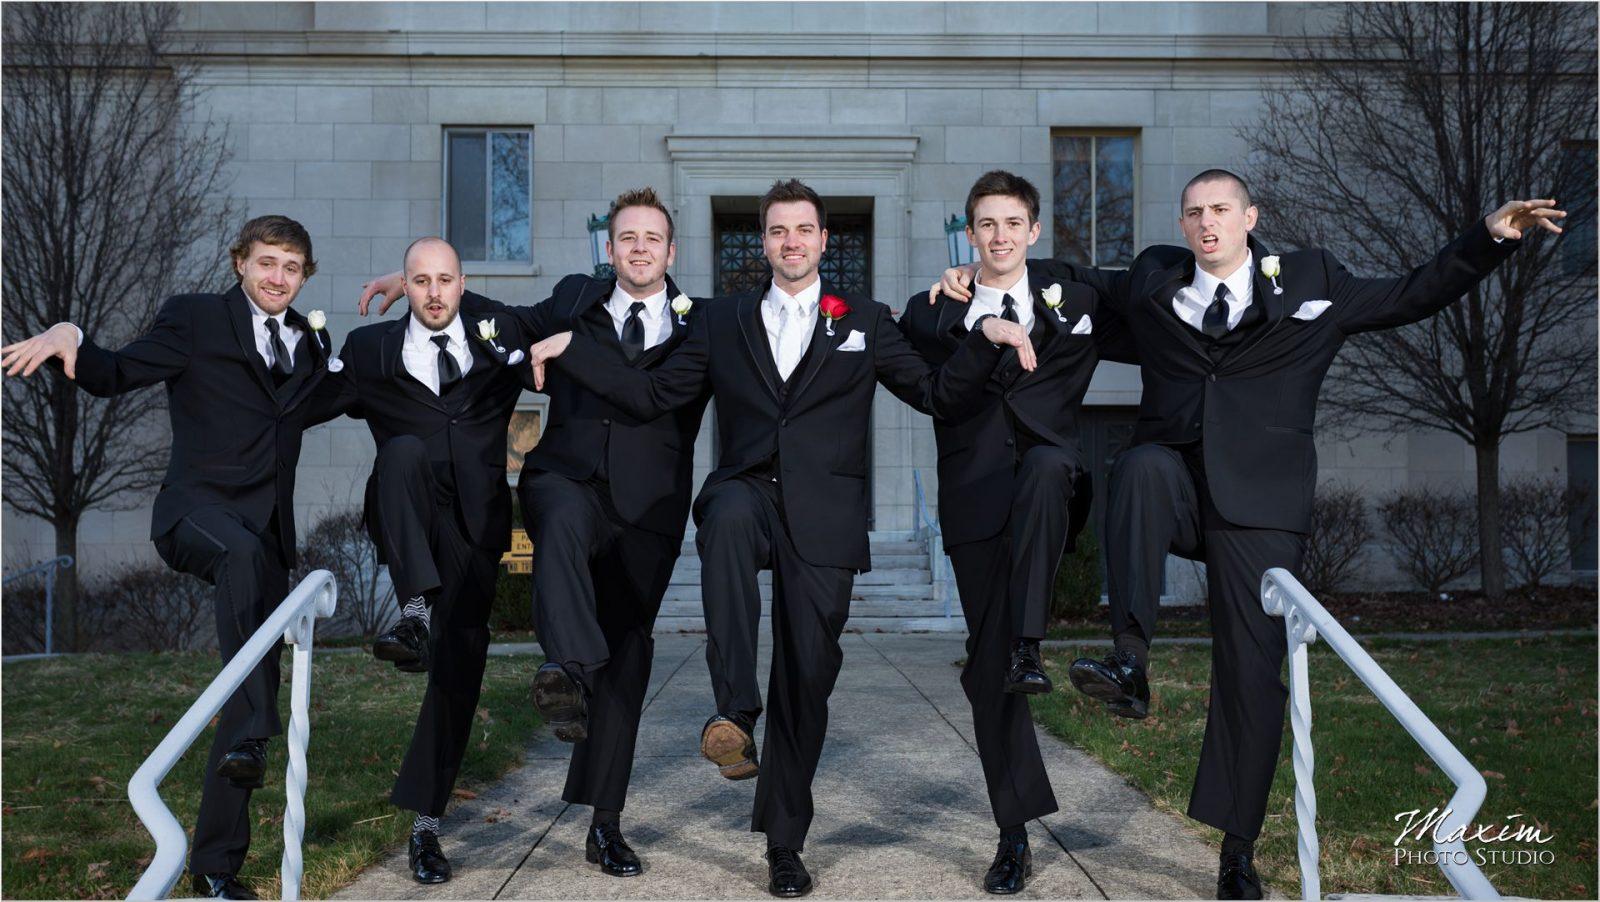 Dayton Masonic Temple groomsmen